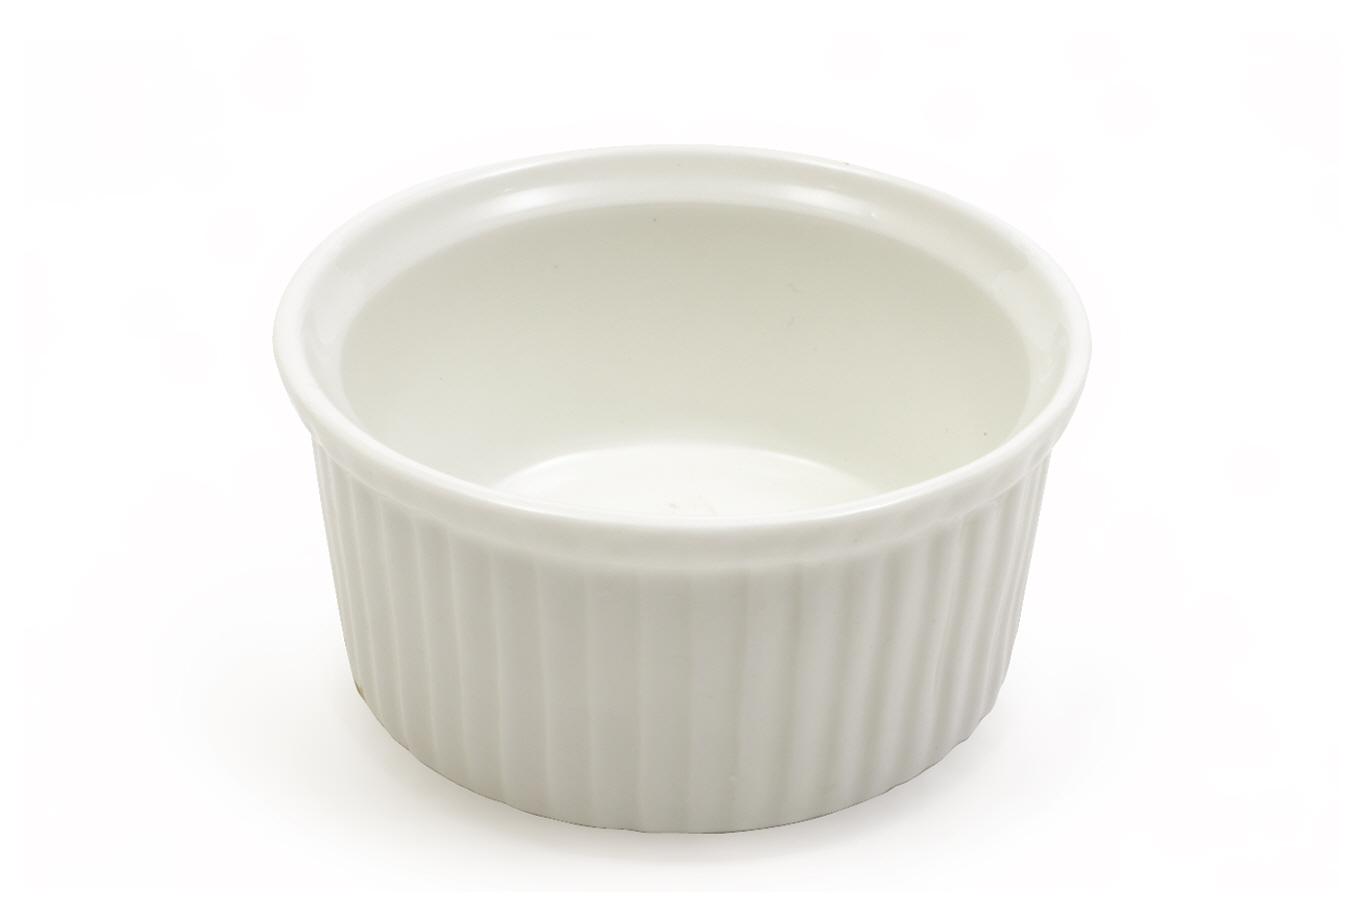 Zapékací Ramekin White Basics 7,5 cm - Maxwell&Williams